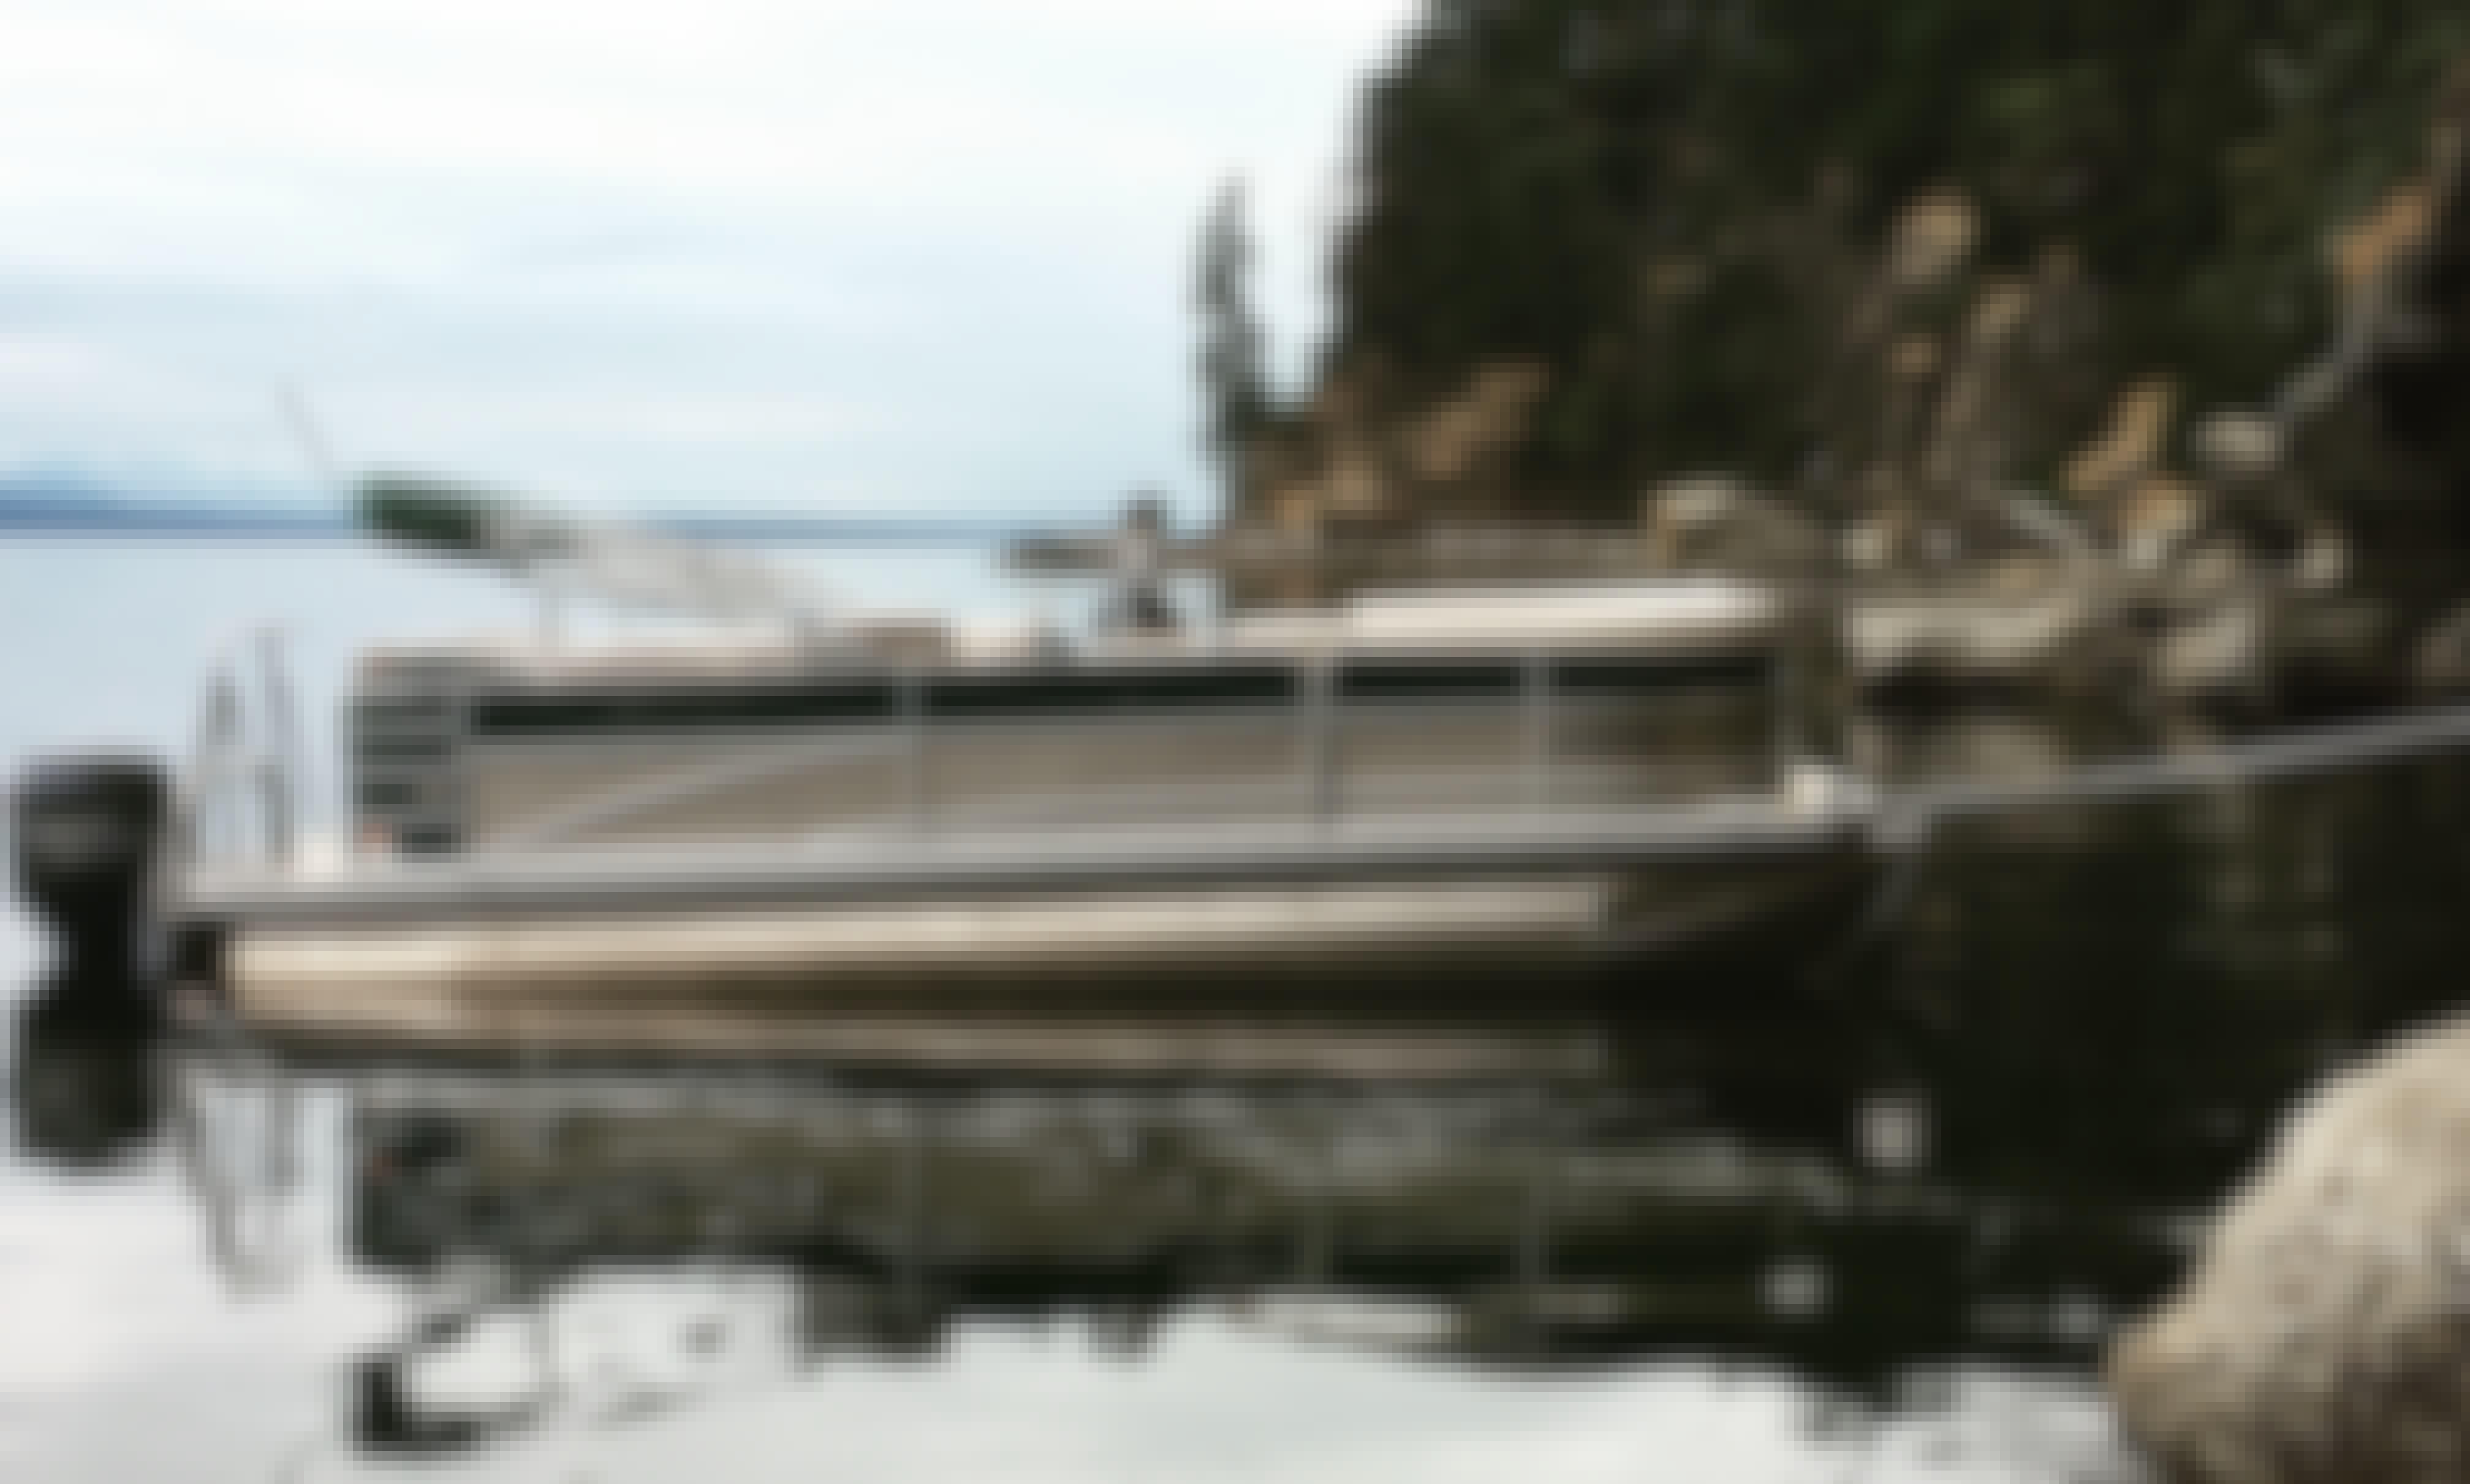 Pontoon for 11 People in Salt Spring Island, British Columbia